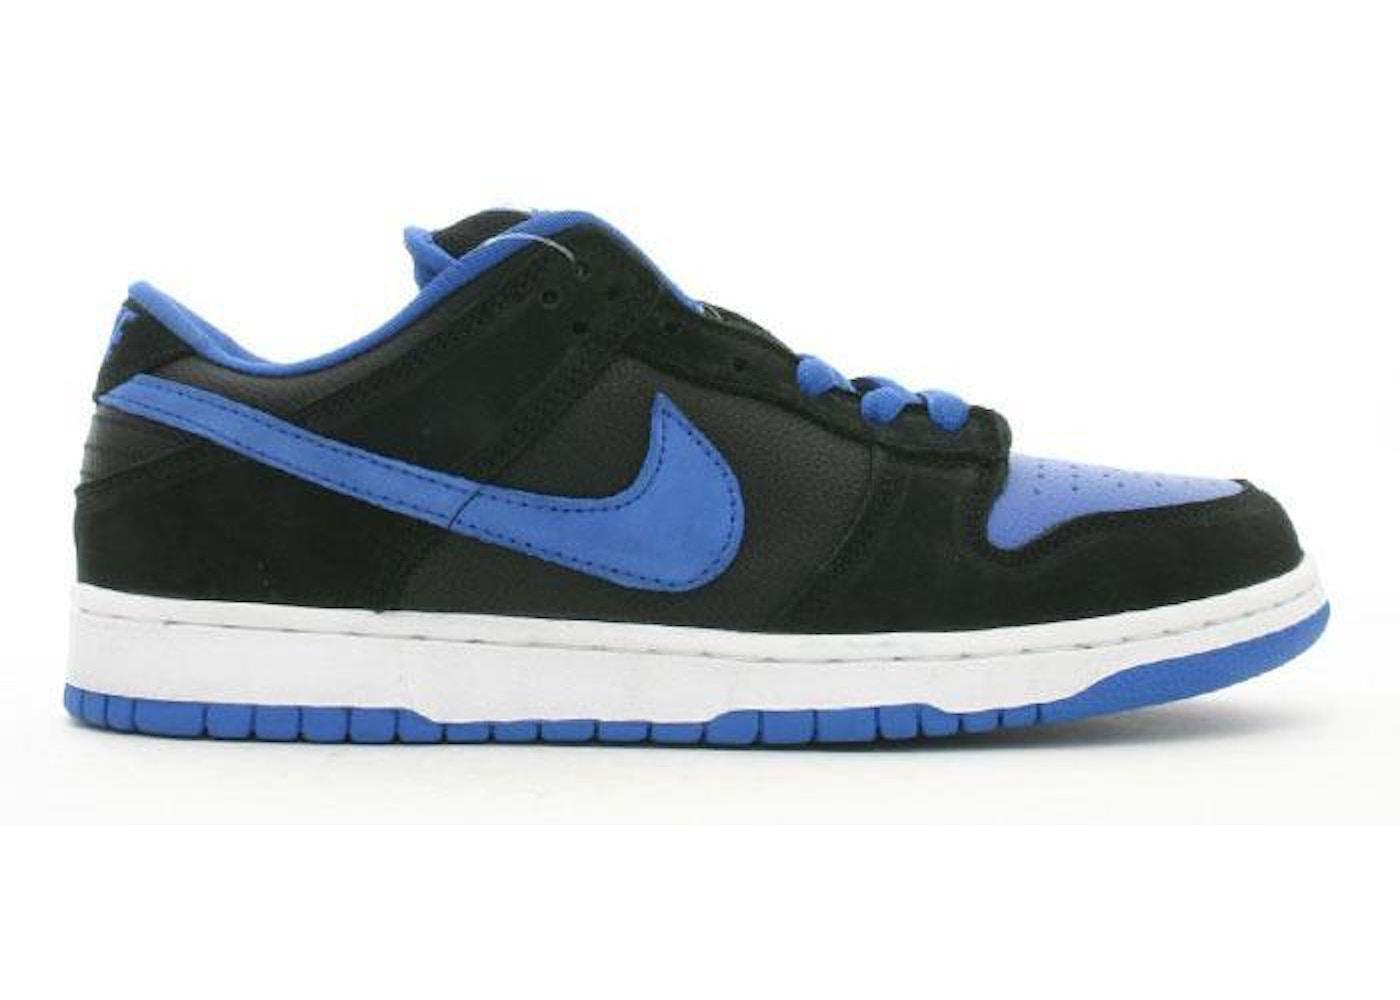 sale retailer 4451d 74b26 Nike Dunk SB Low J Pack Royal - 304292-041